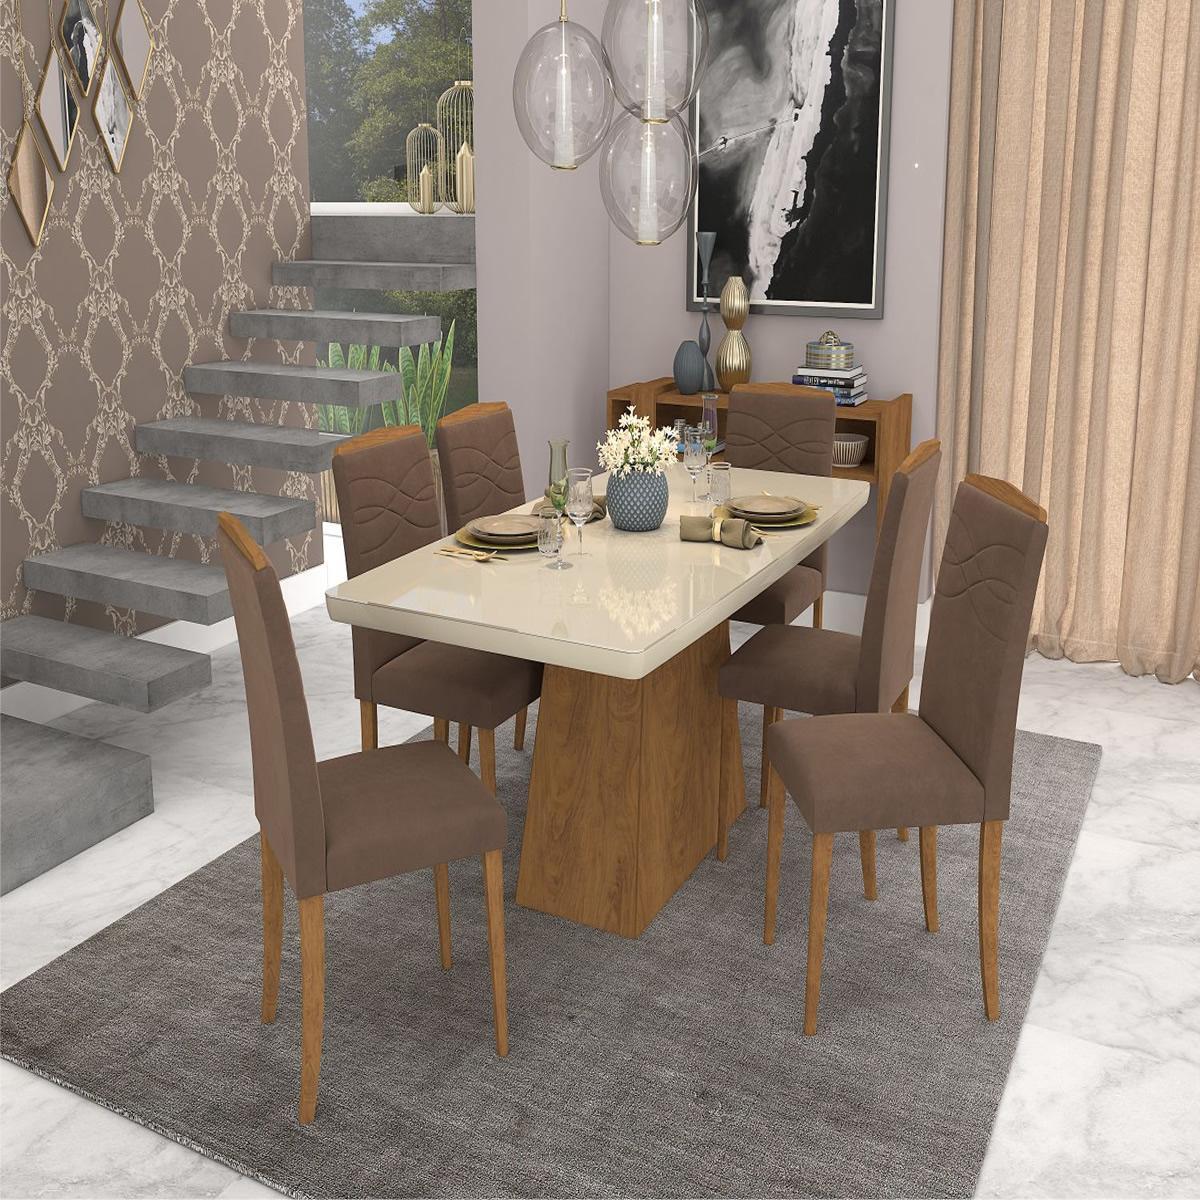 Sala Jantar Helen 180cm x 90cm 6 Cad. Vanessa - Savana/Off White/Chocolate - Cimol